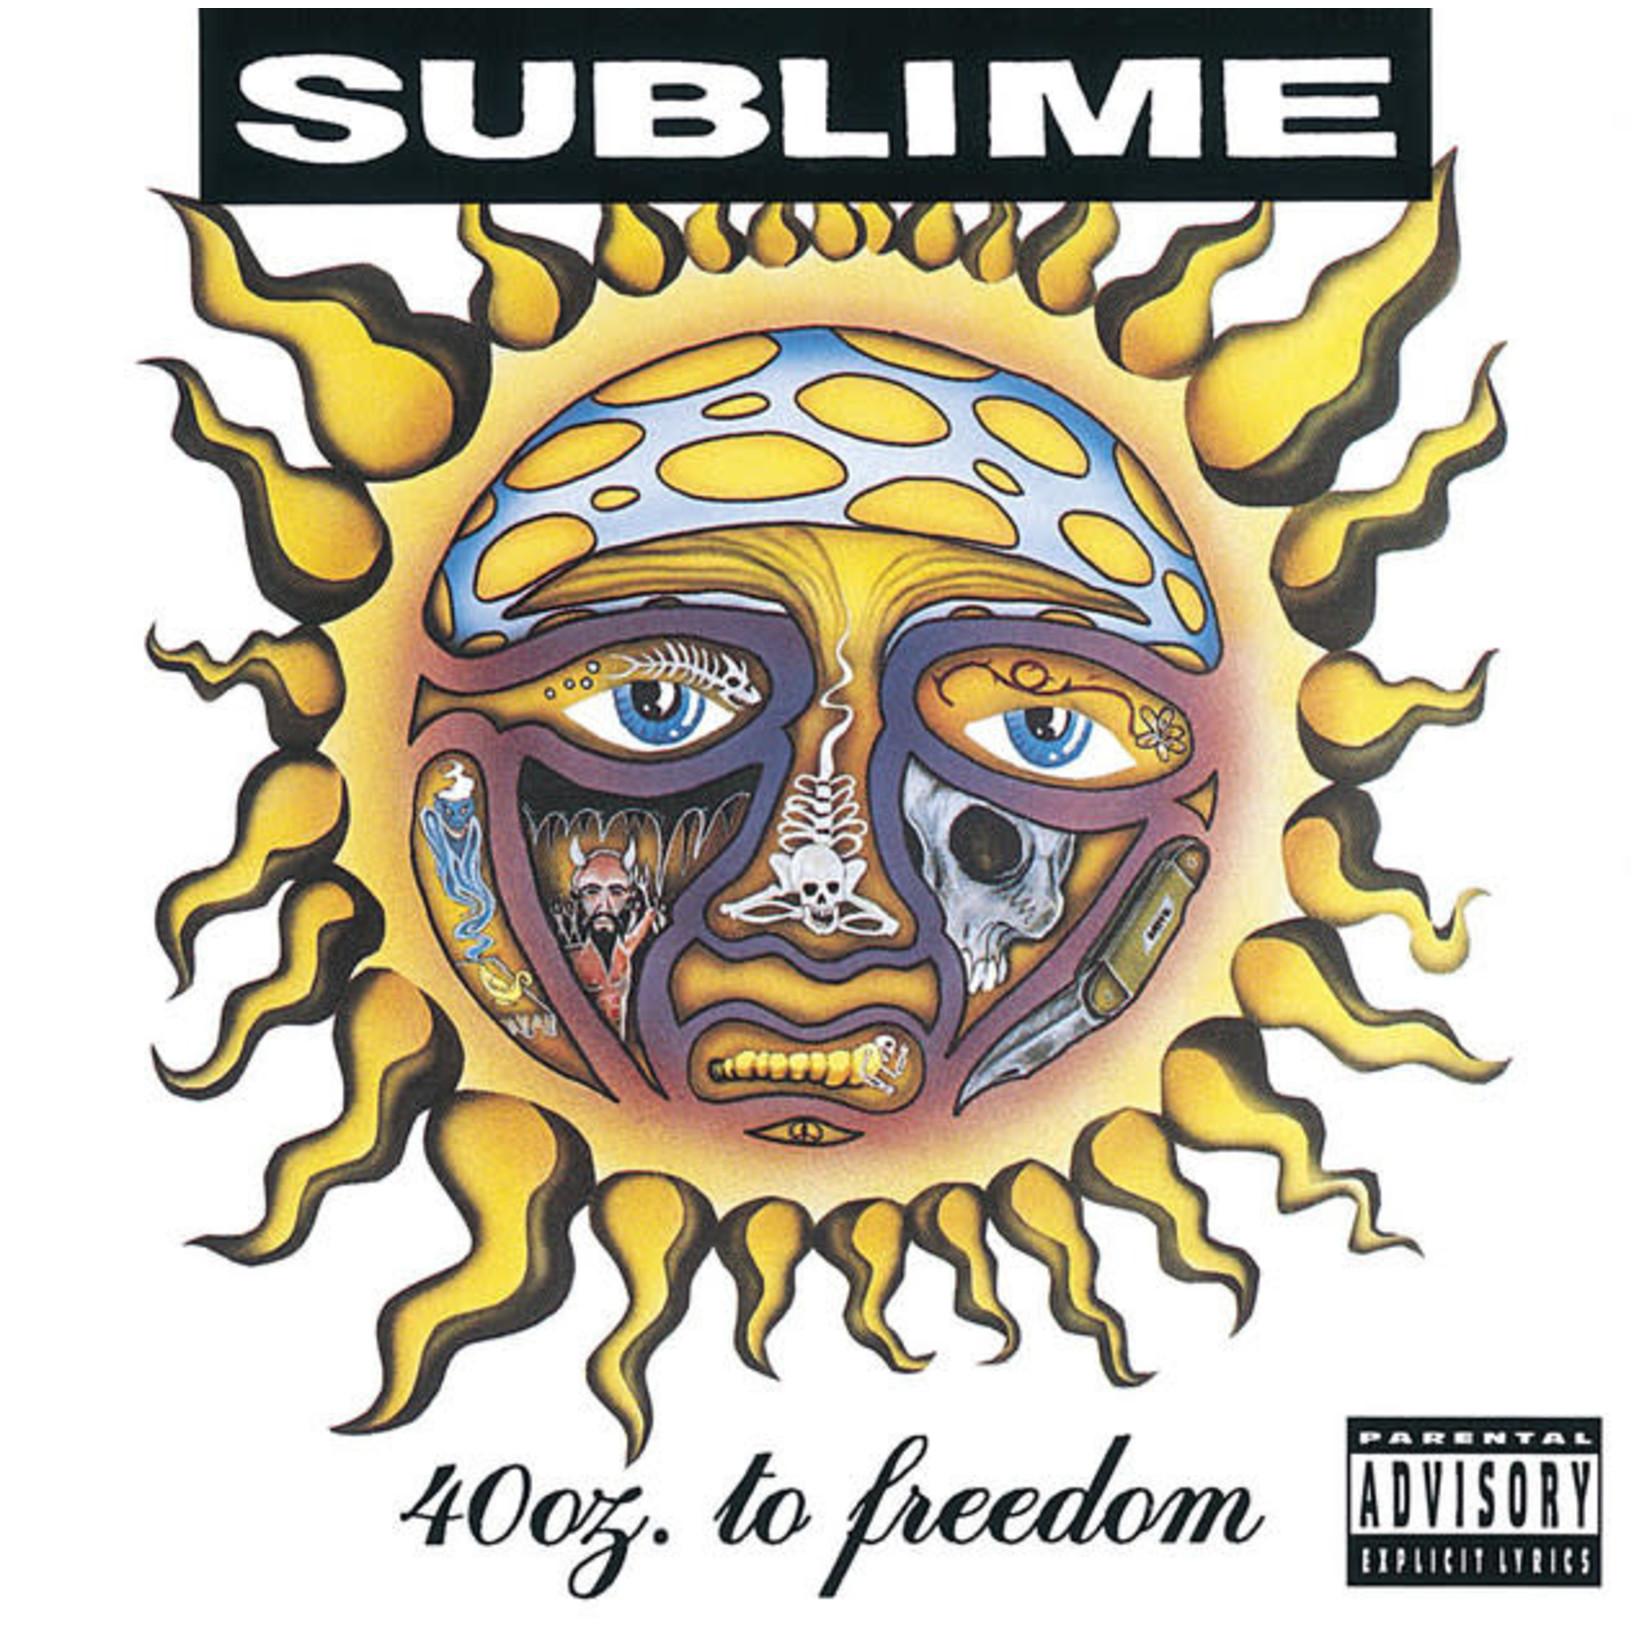 Vinyl Sublime - 40 oz. to Freedom